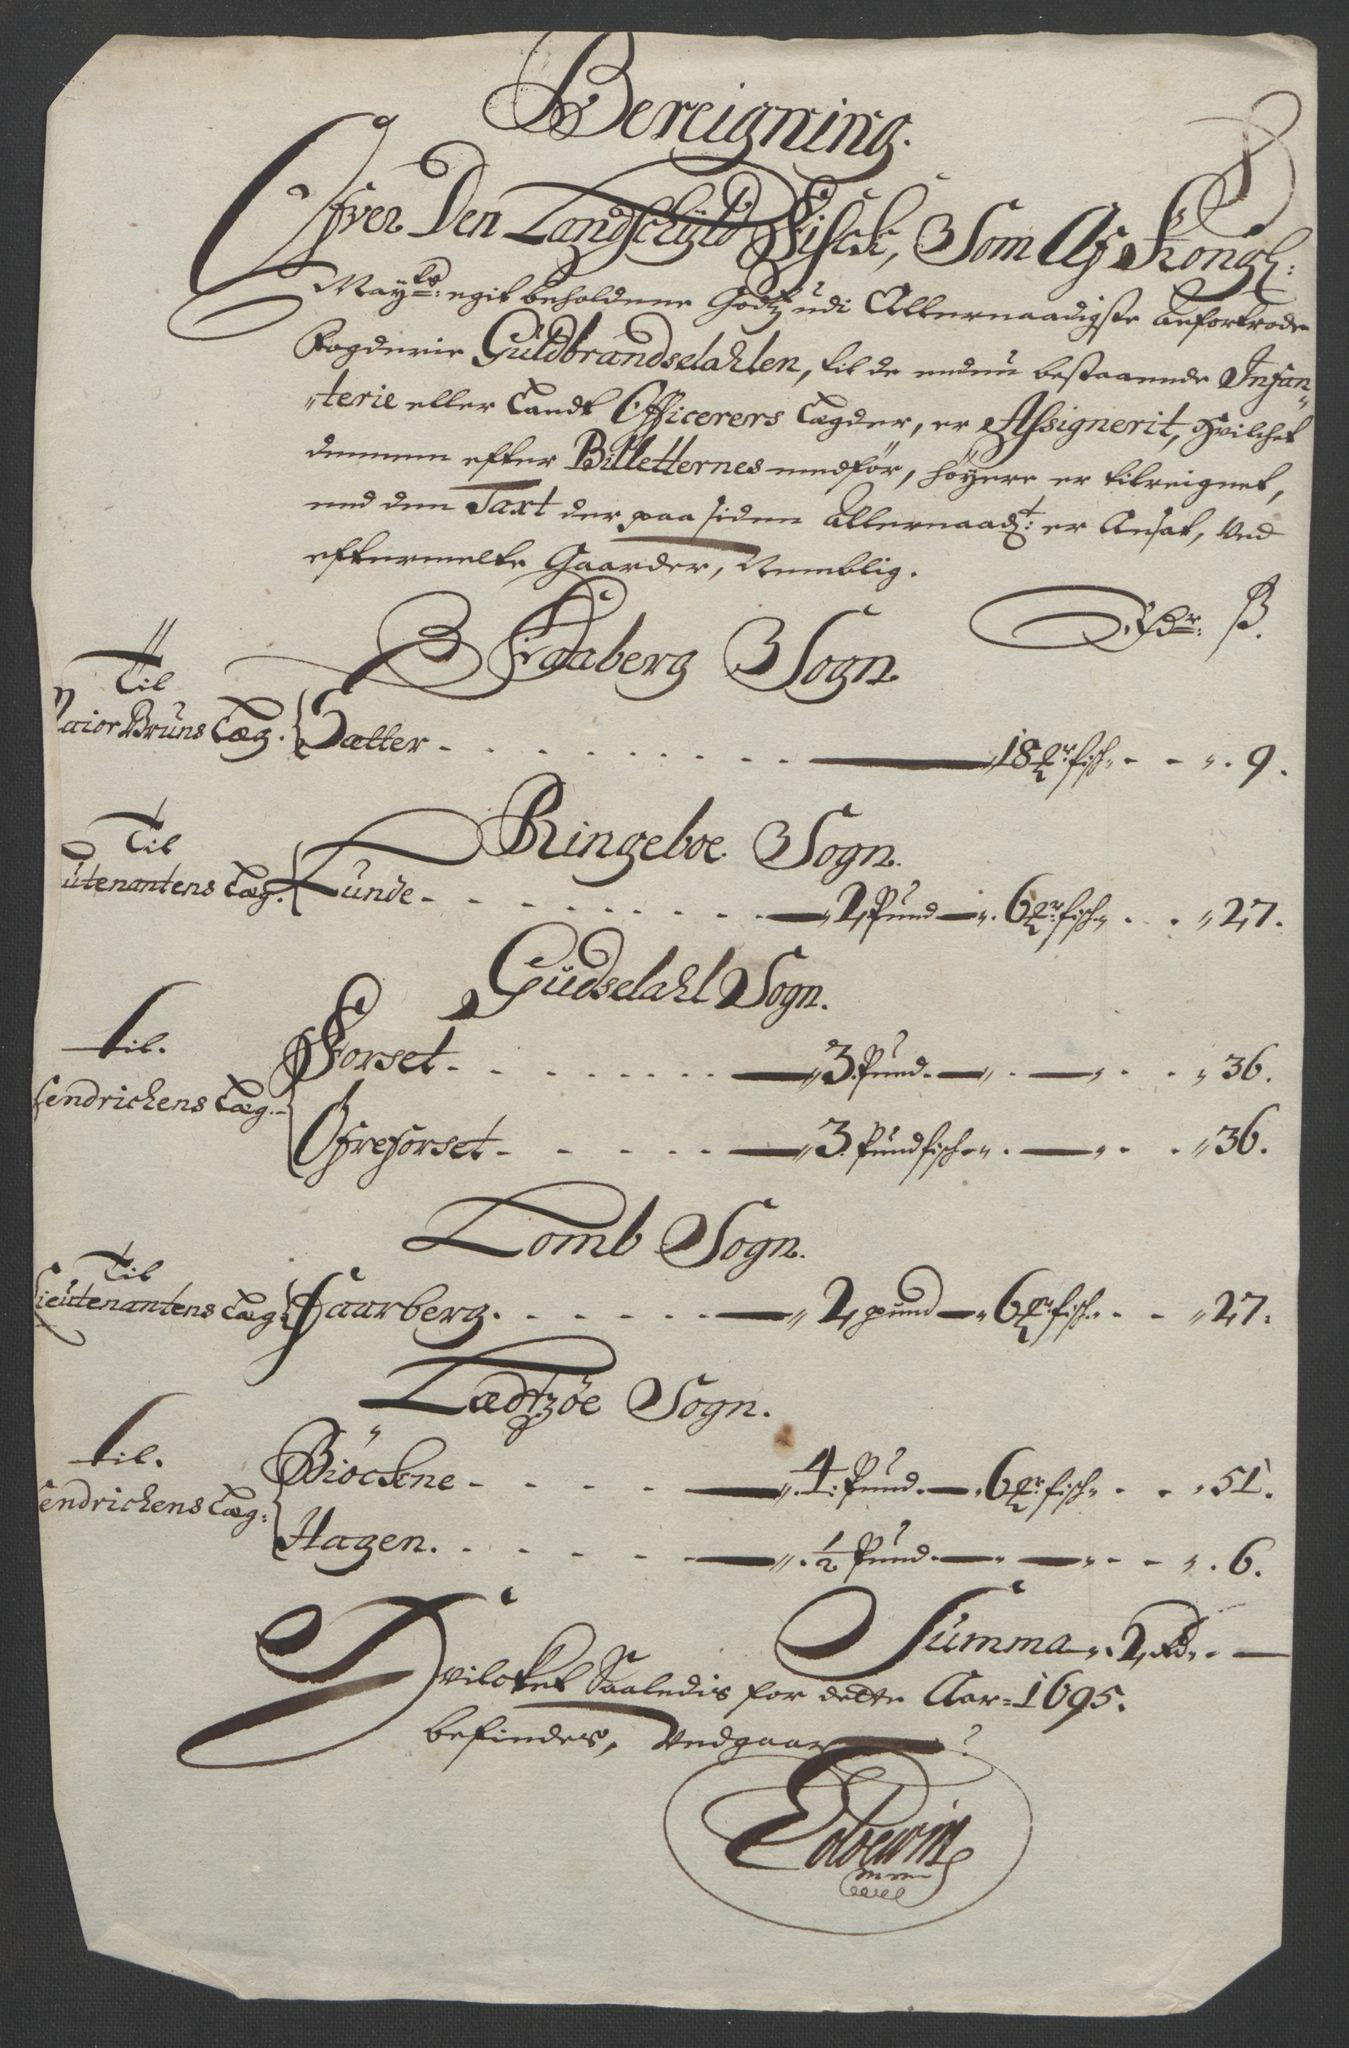 RA, Rentekammeret inntil 1814, Reviderte regnskaper, Fogderegnskap, R17/L1169: Fogderegnskap Gudbrandsdal, 1695, s. 104